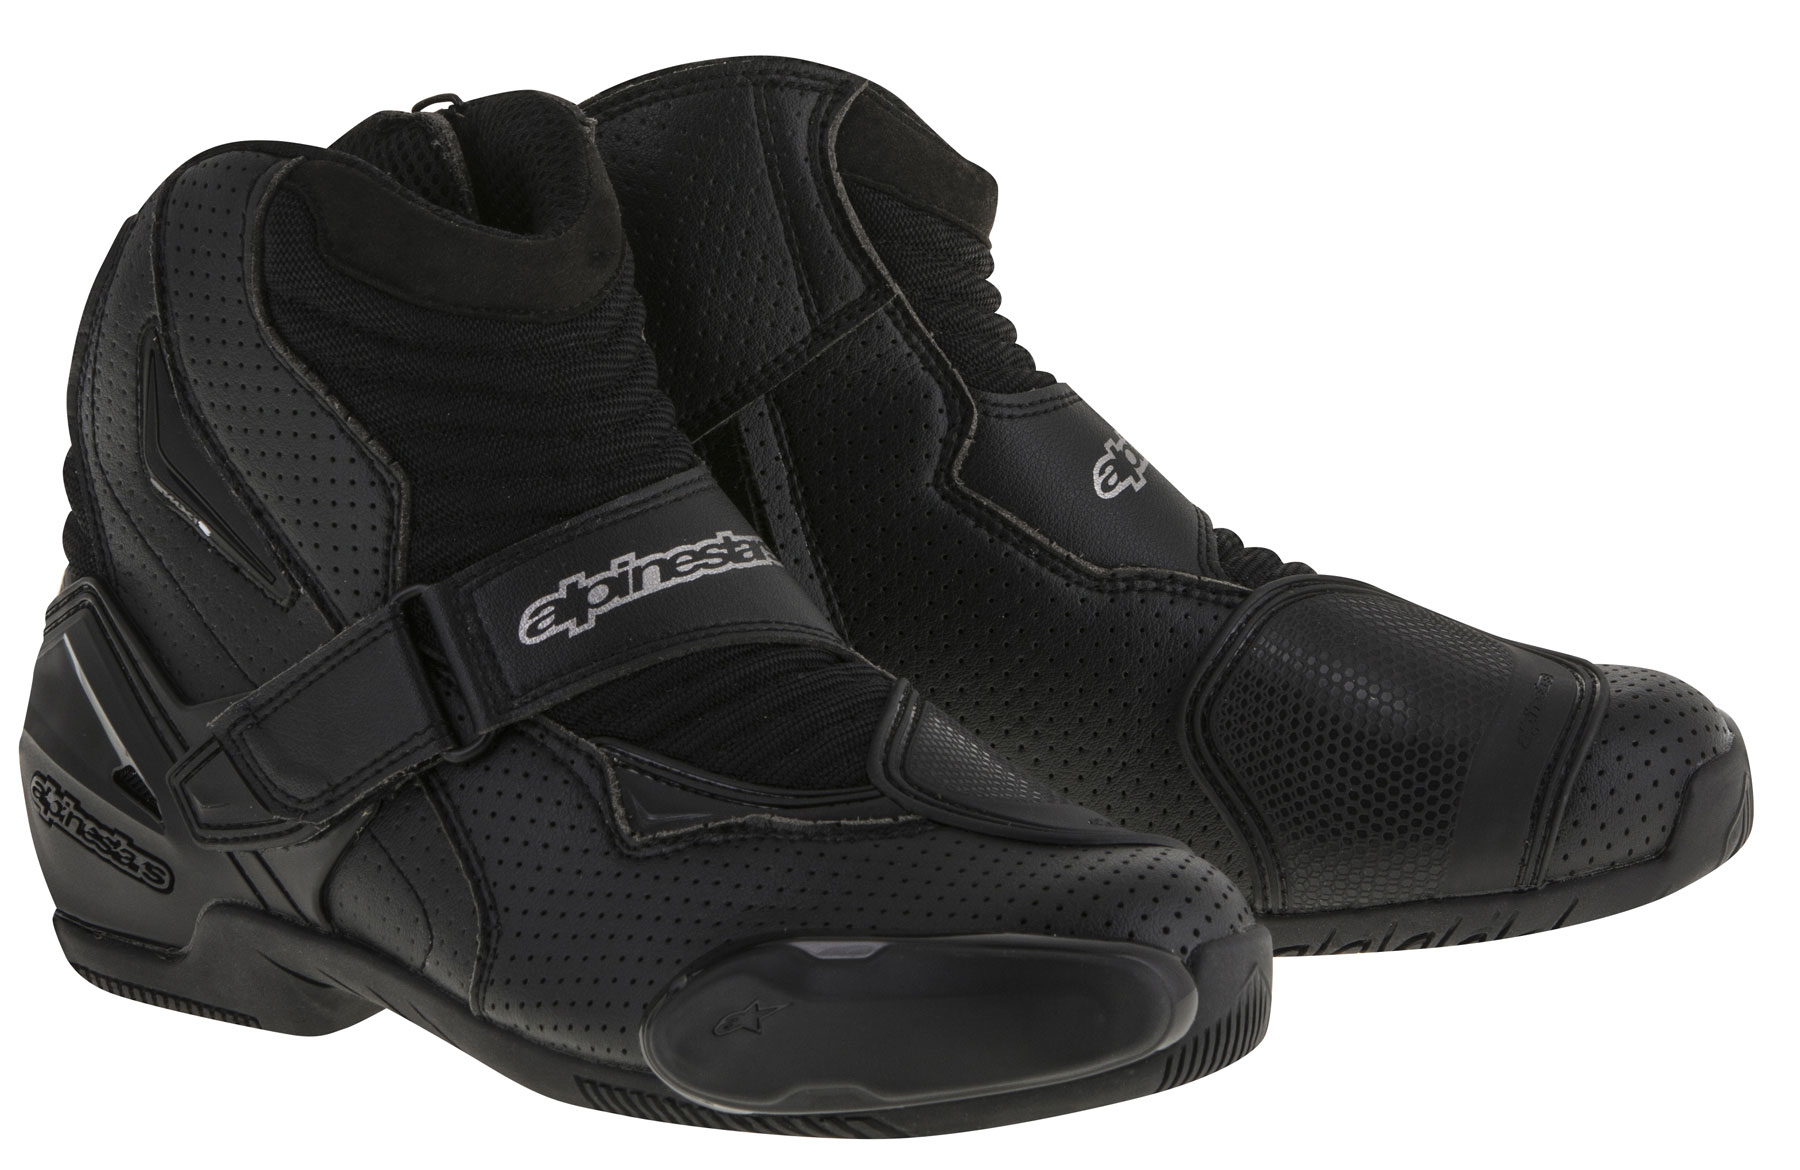 Alpinestars SMX-1 R Vented Low-Cut Boots (Black)